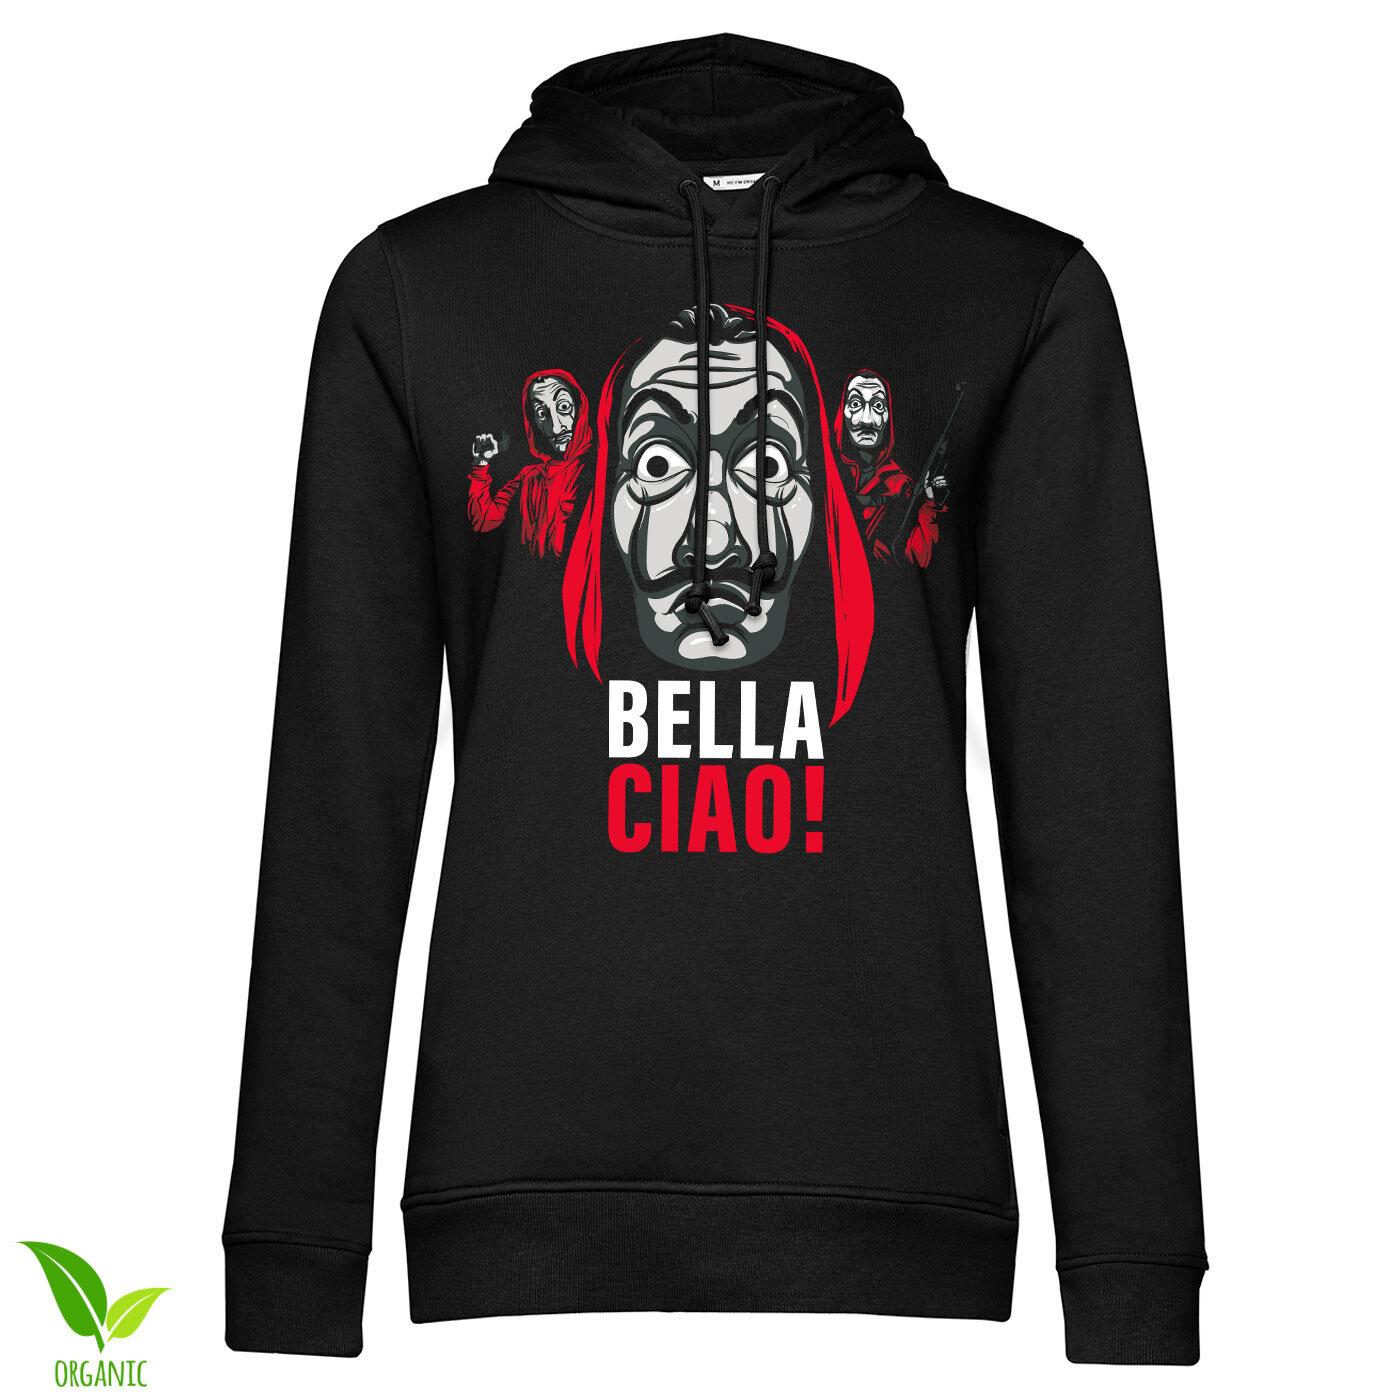 La Casa De Papel - Bella Ciao! Girls Hoodie